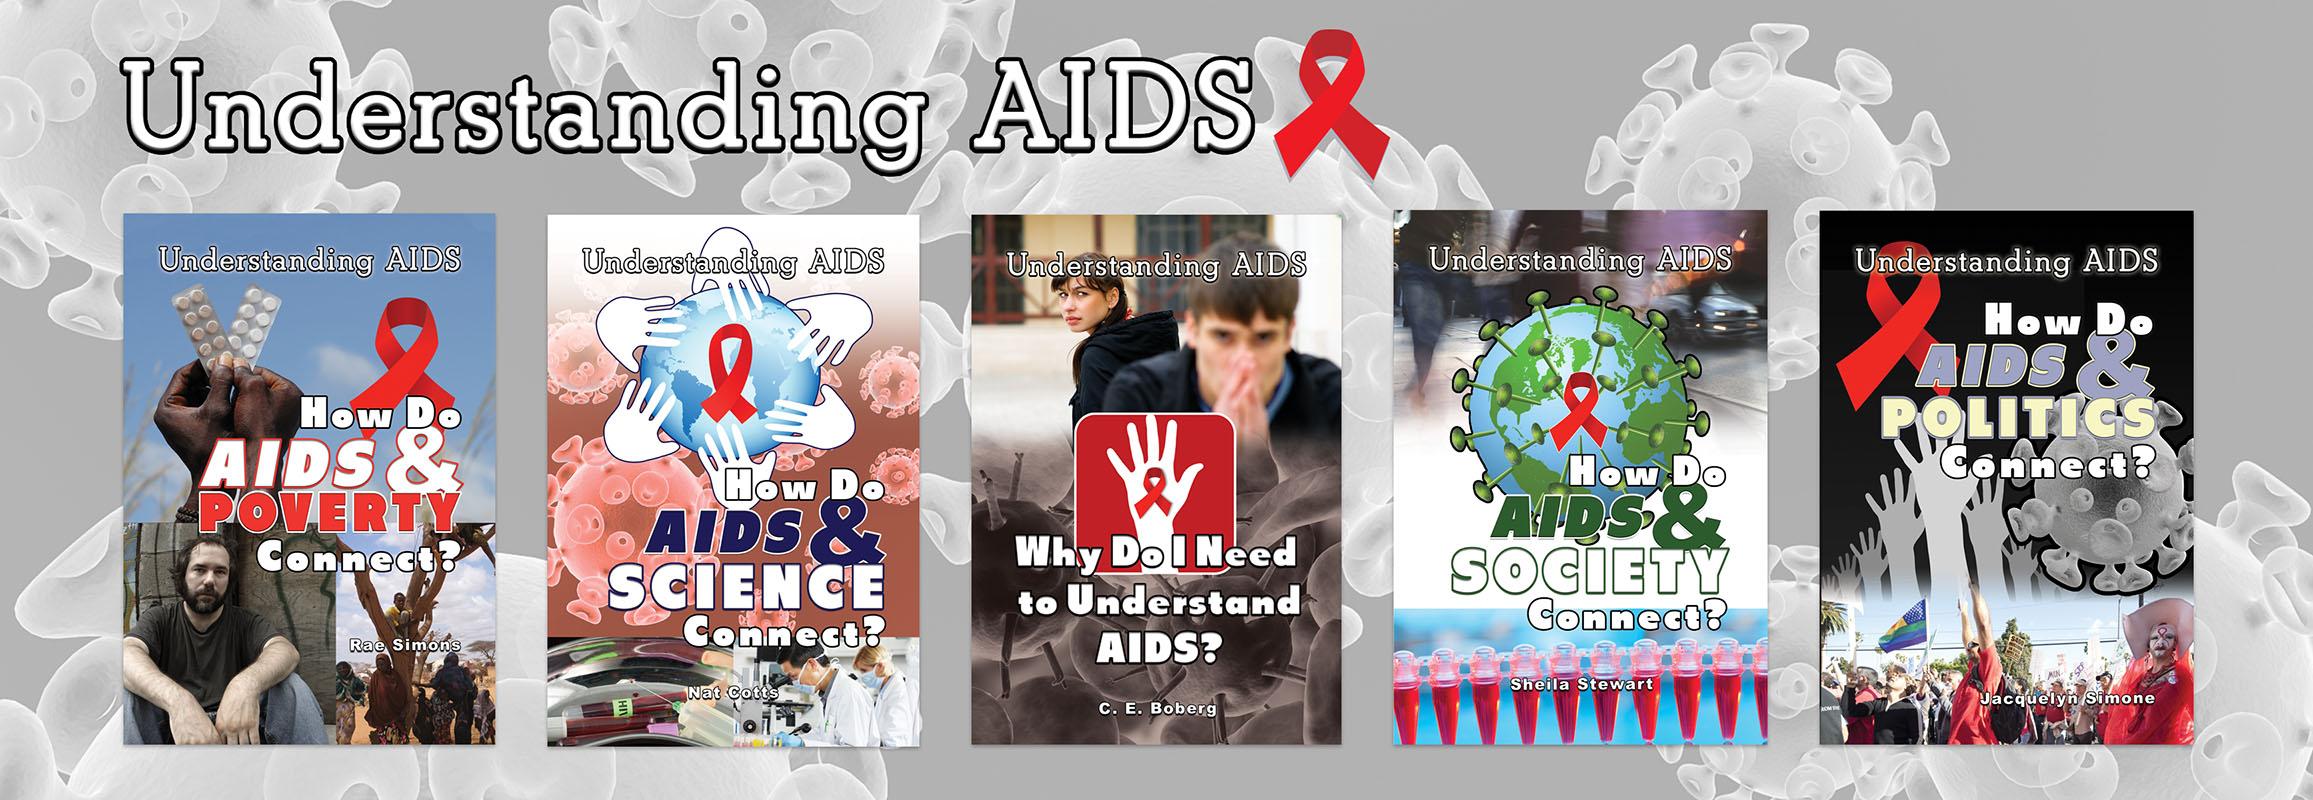 AIDS banner.jpg